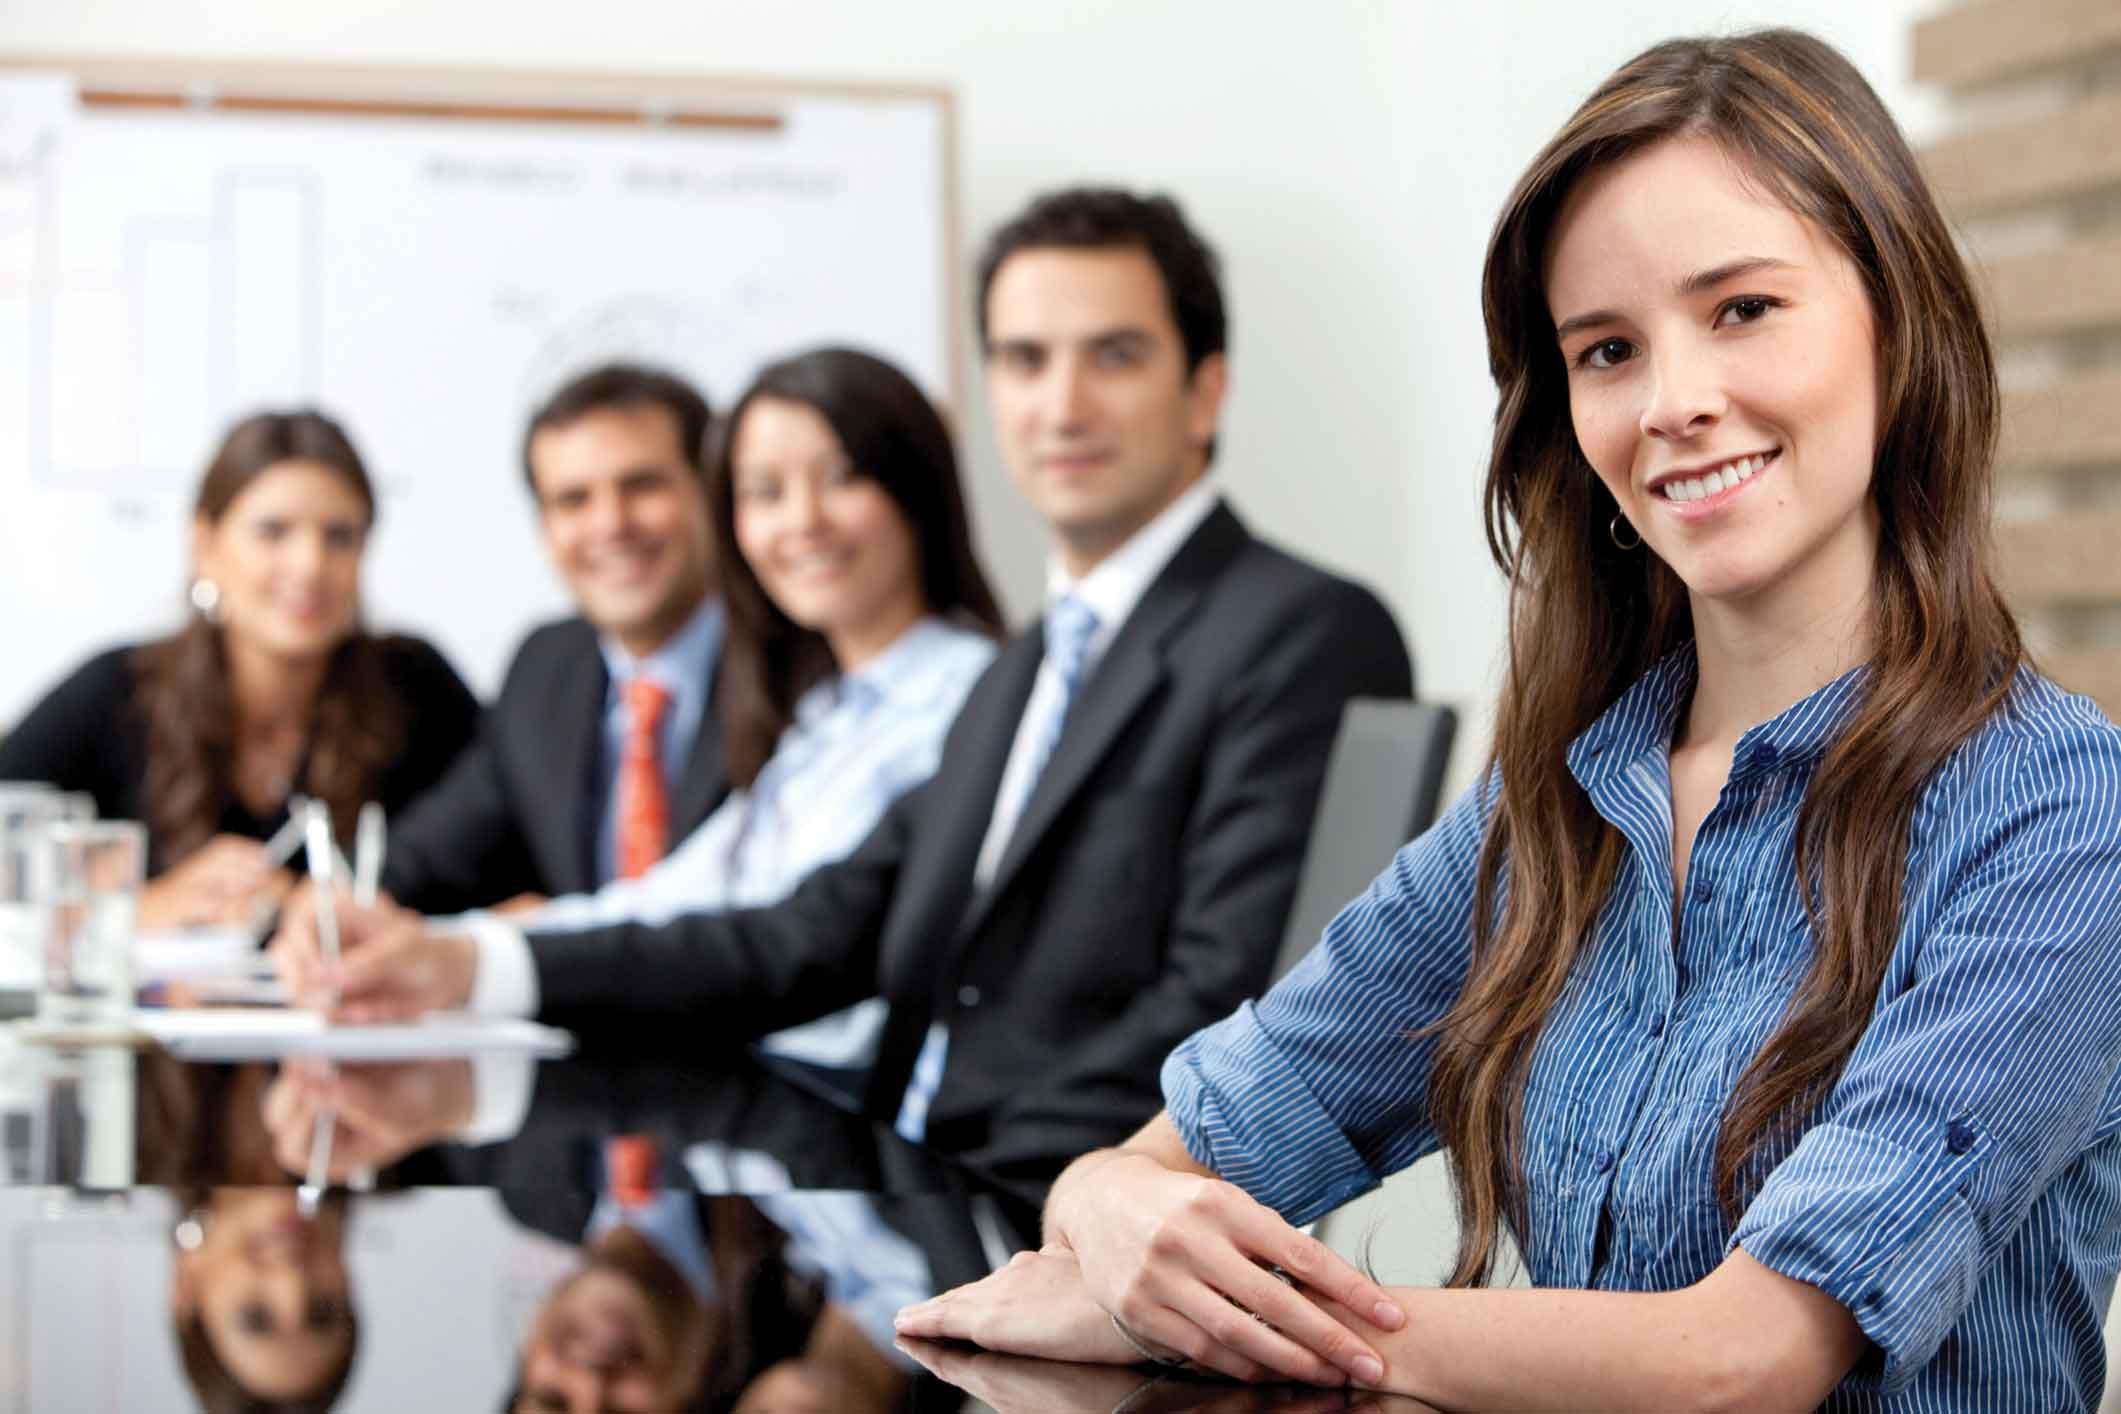 douglas college career focus wage subsidy program burnaby board douglas college career focus wage subsidy program